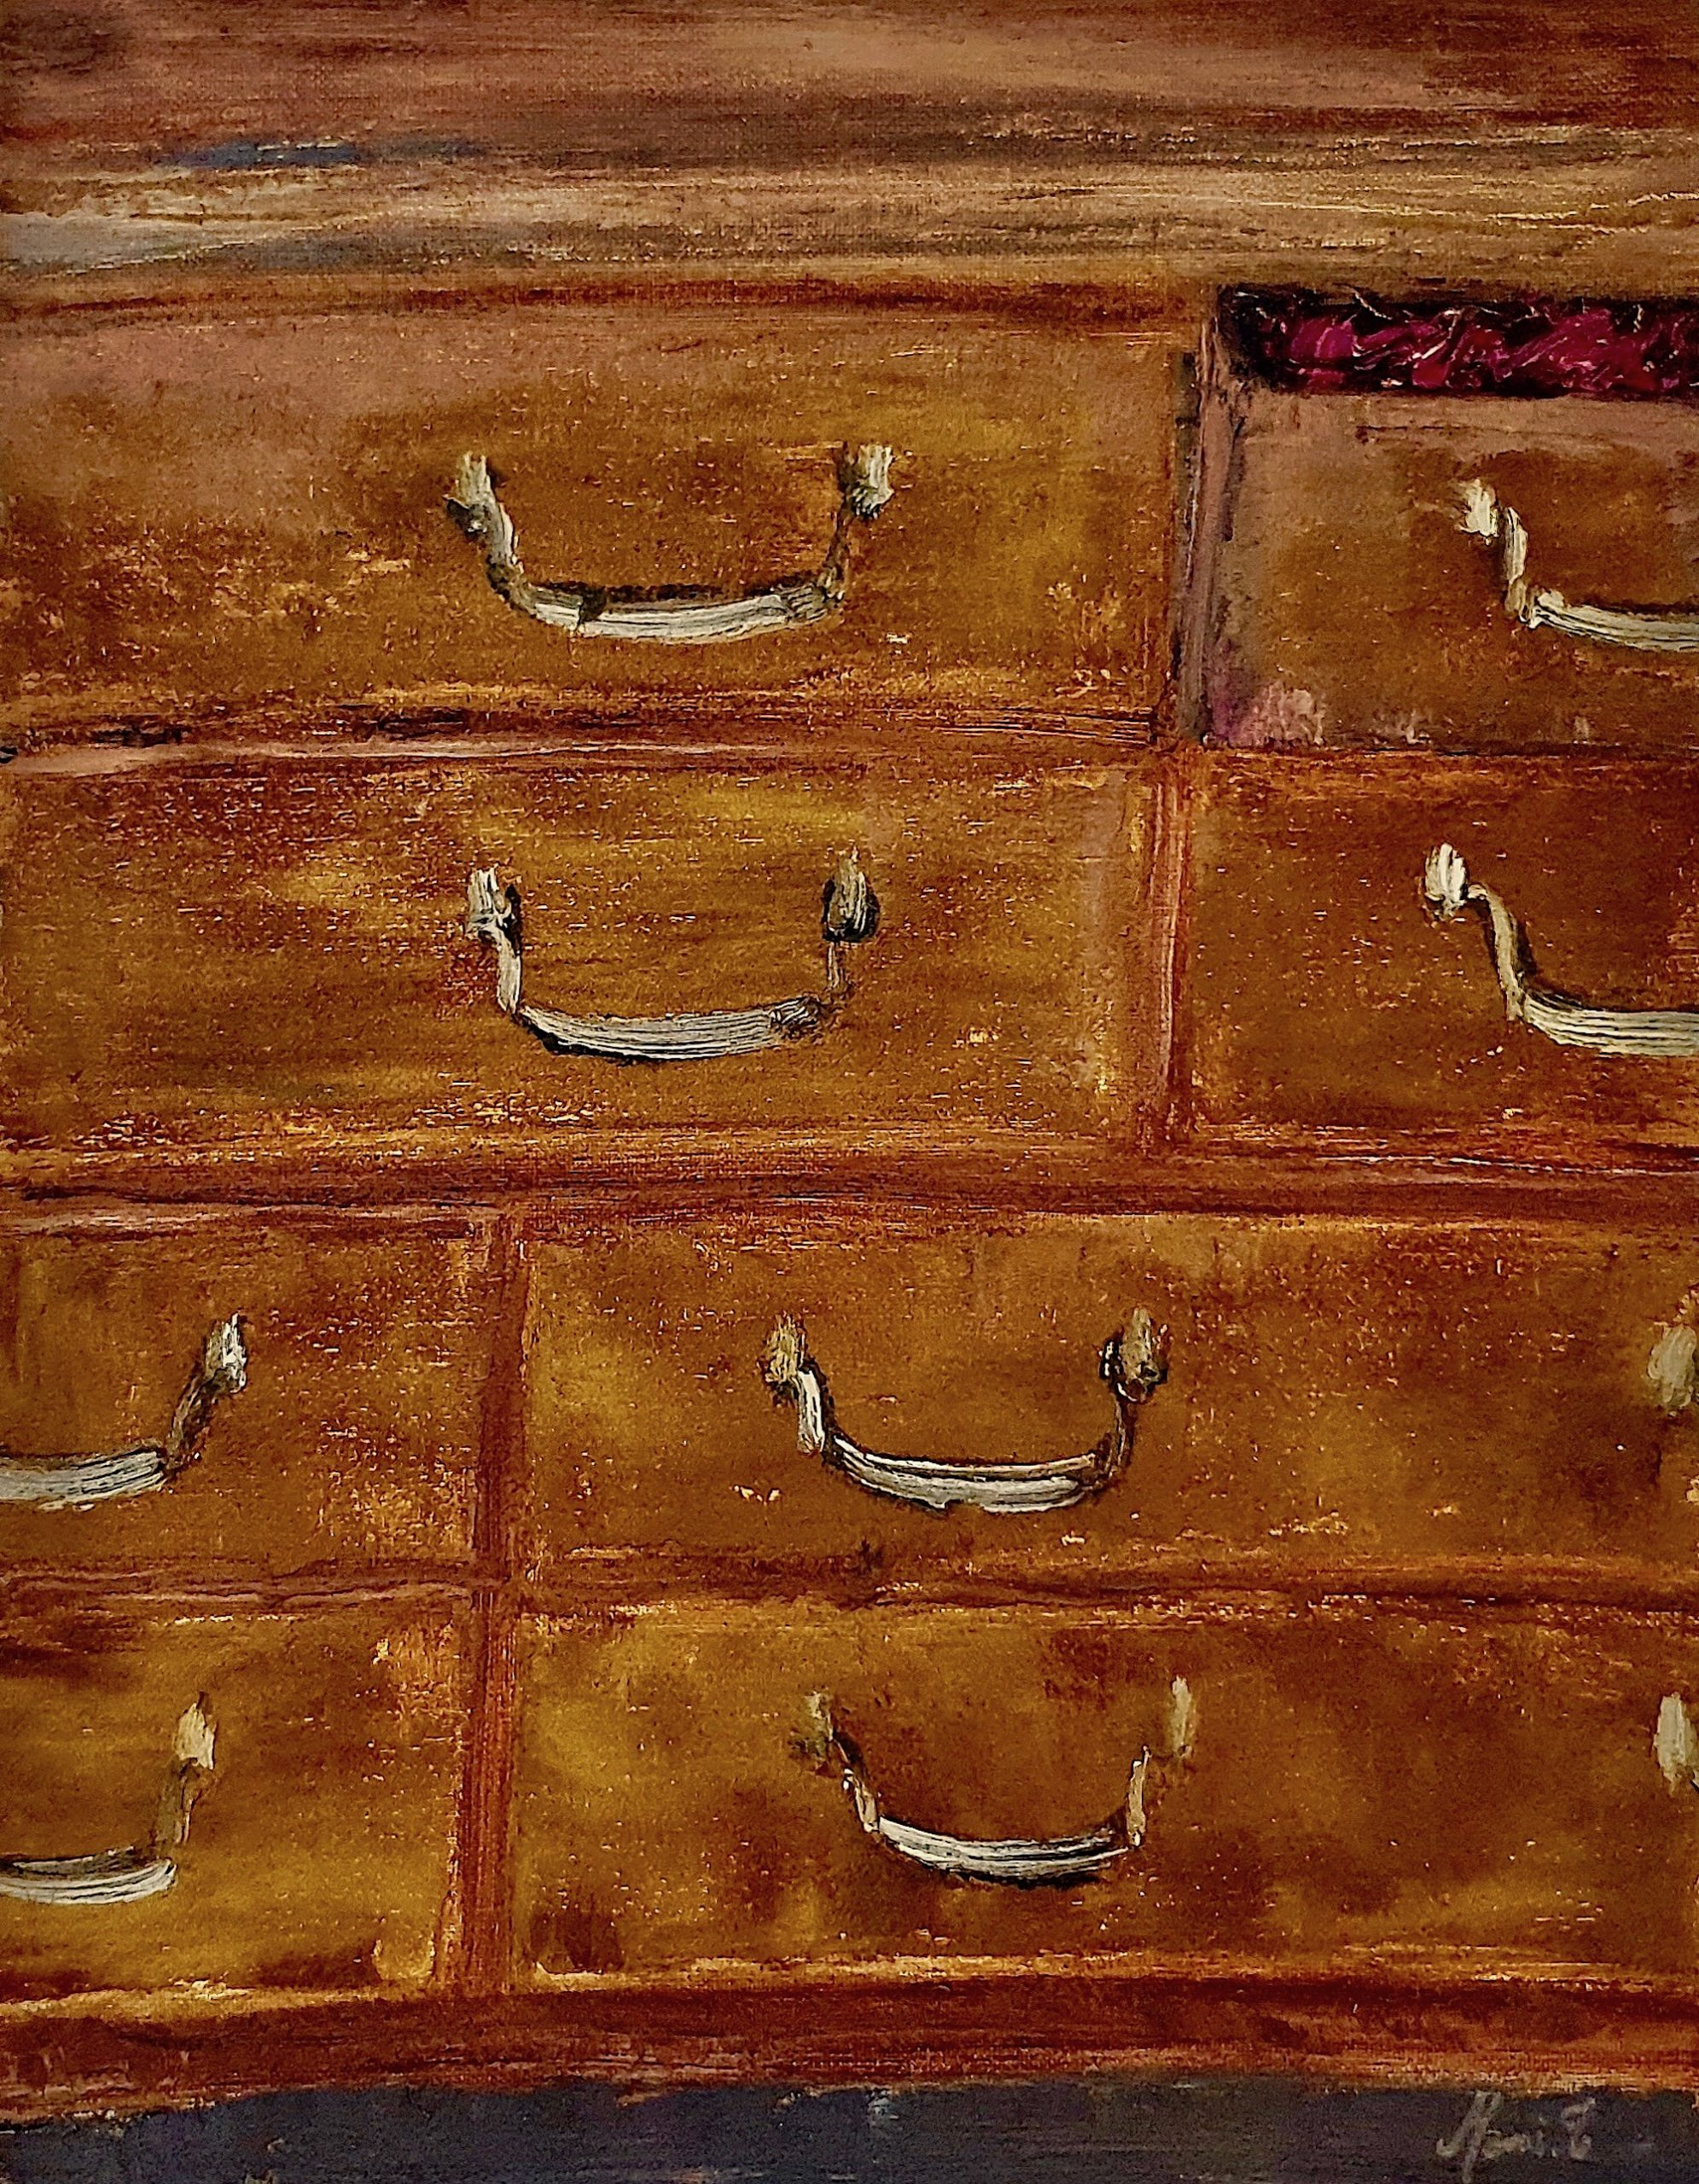 MAMI / Images et Poésie, JAZZ MOOD (The drawers )